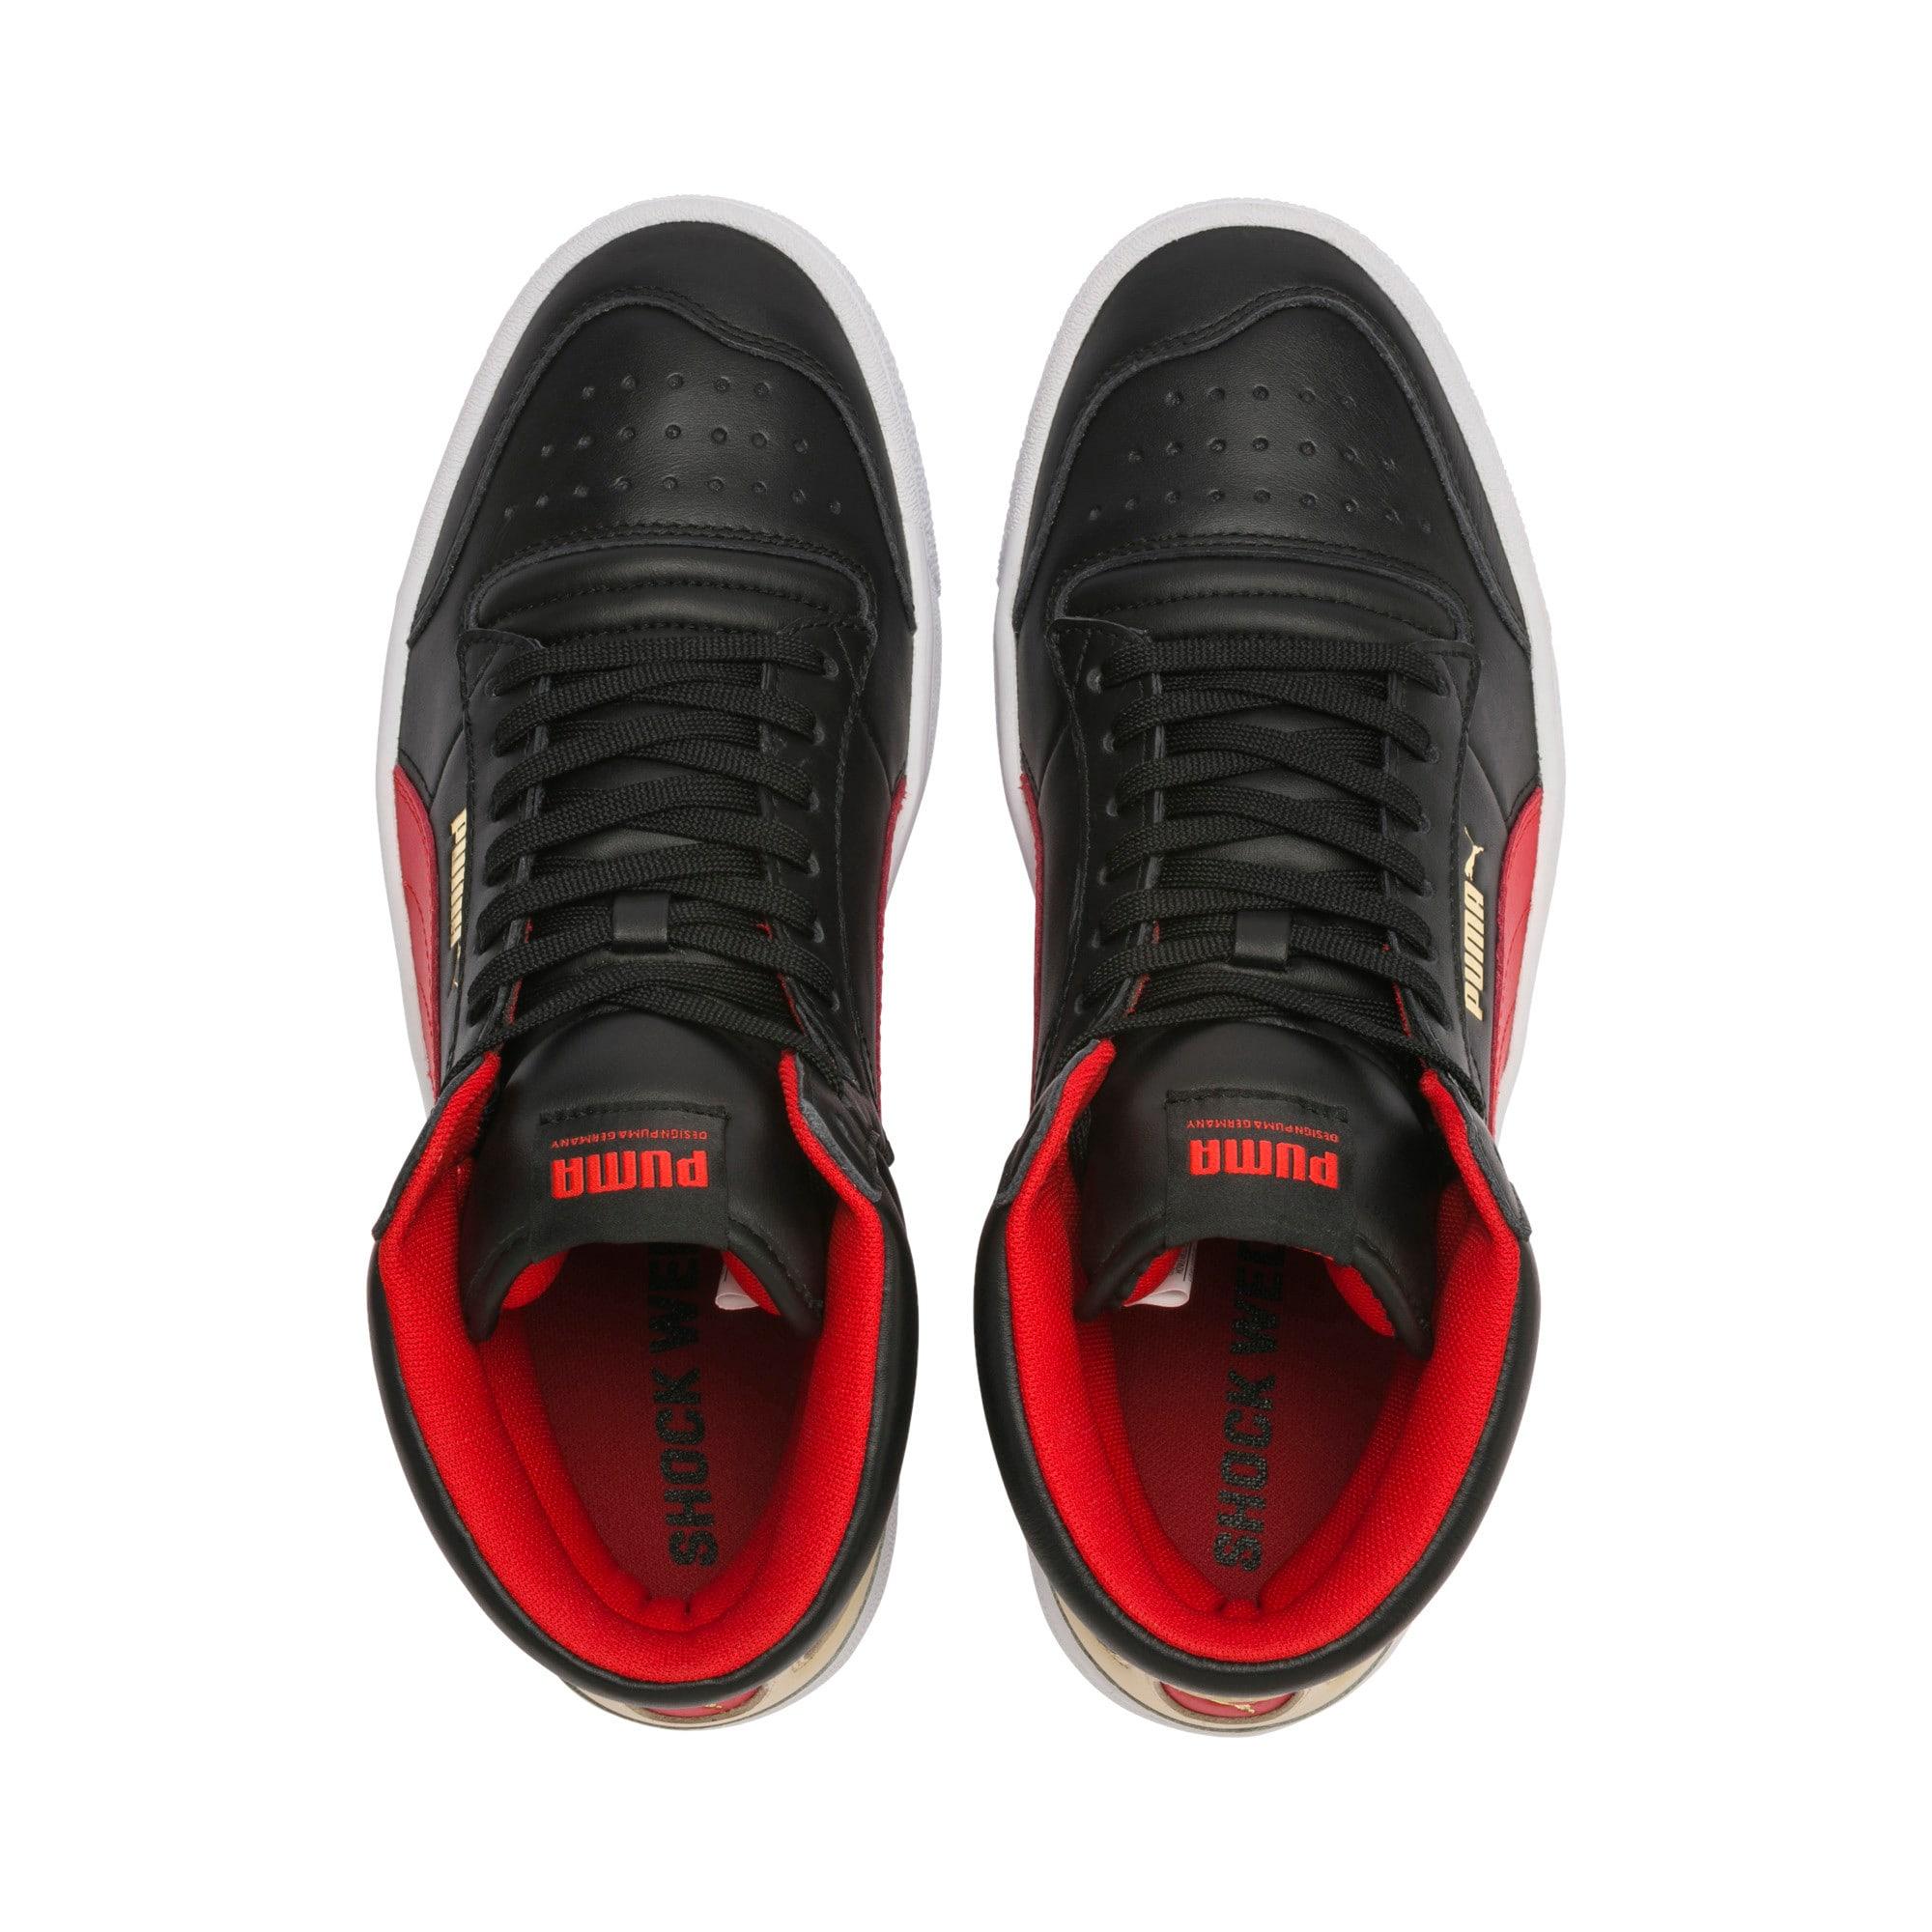 Thumbnail 6 of Ralph Sampson Mid Sneakers, PBlack-High Risk Red-PWhite, medium